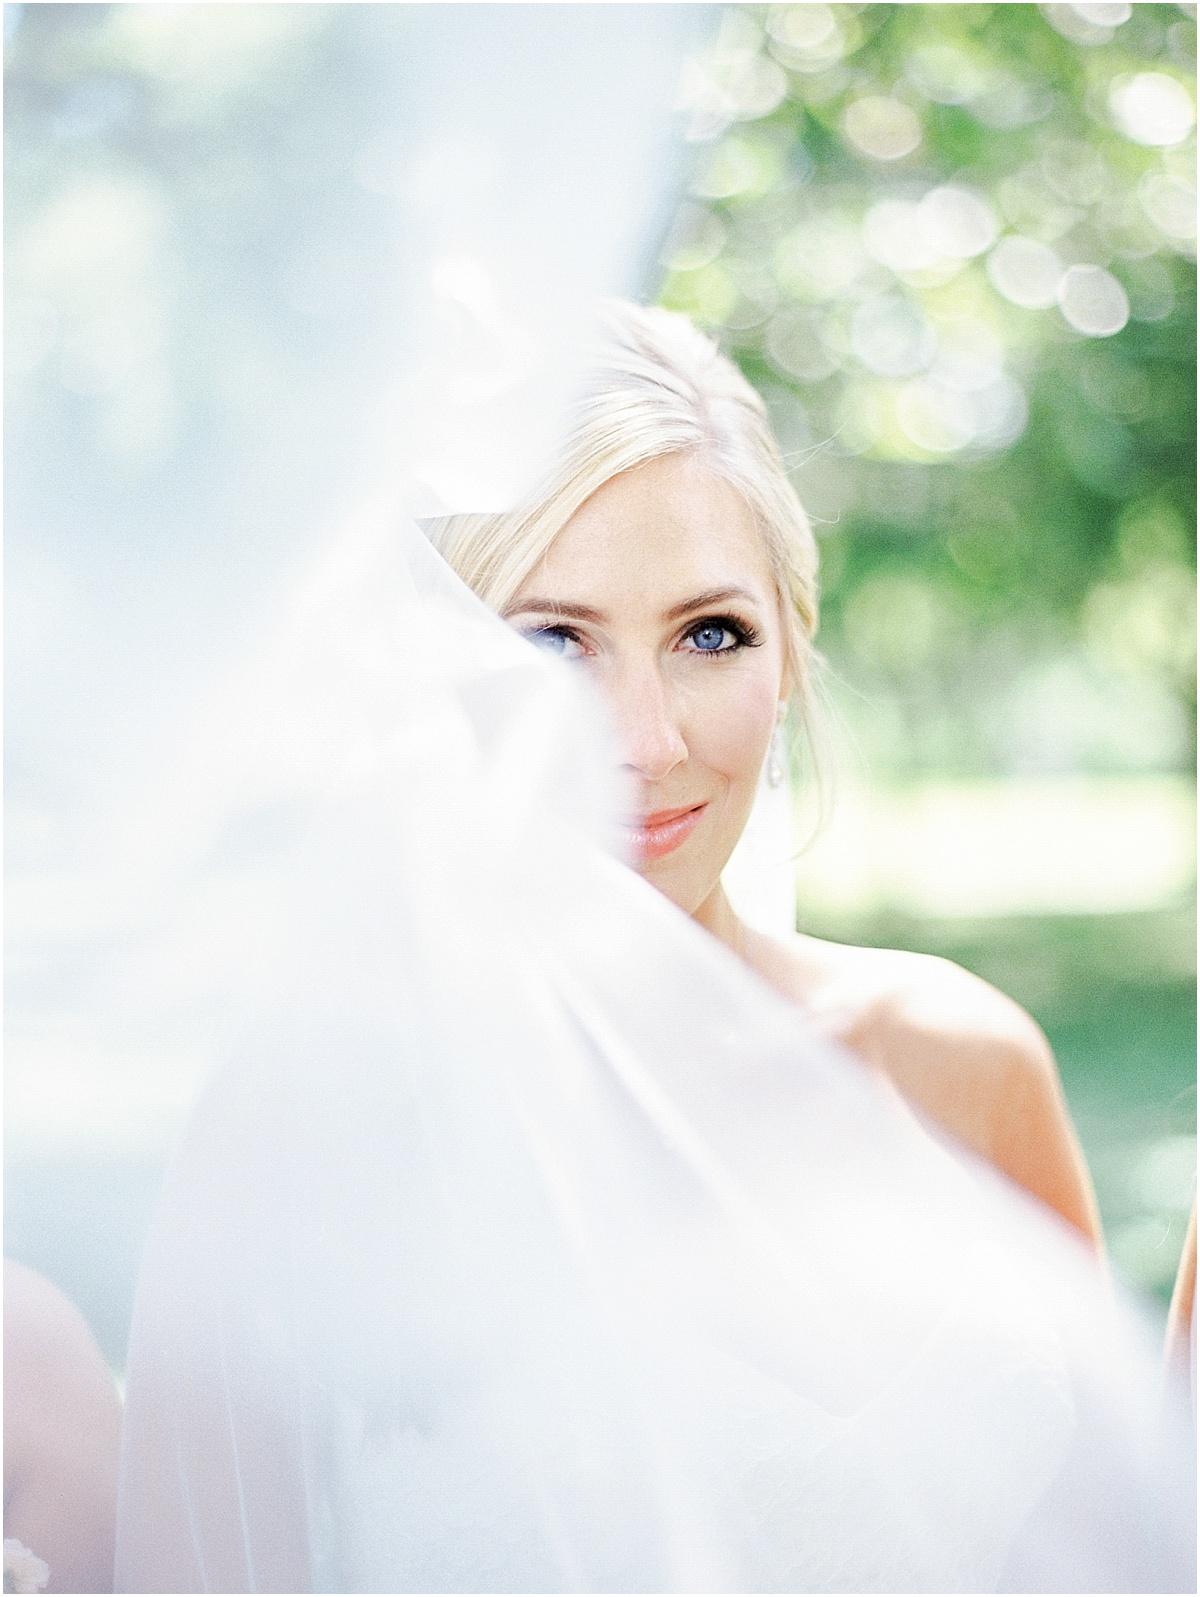 St_Louis_Wedding_Fine_Art_Film_Photographer_Jordan_Brittley_(www.jordanbrittley.com)_0025.jpg